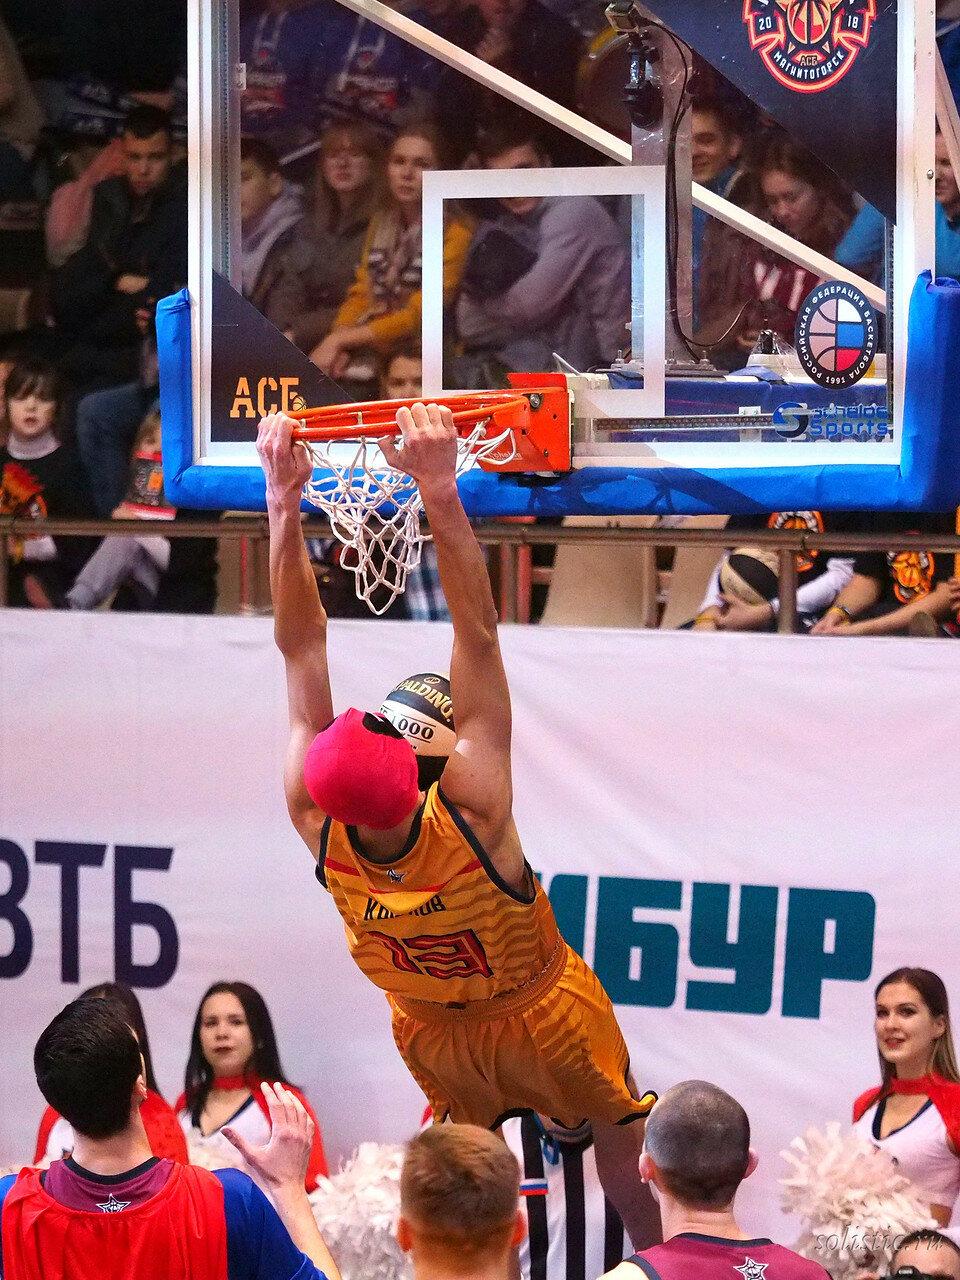 85 Матч звезд АСБ 2018 (ассоциации студенческого баскетбола)